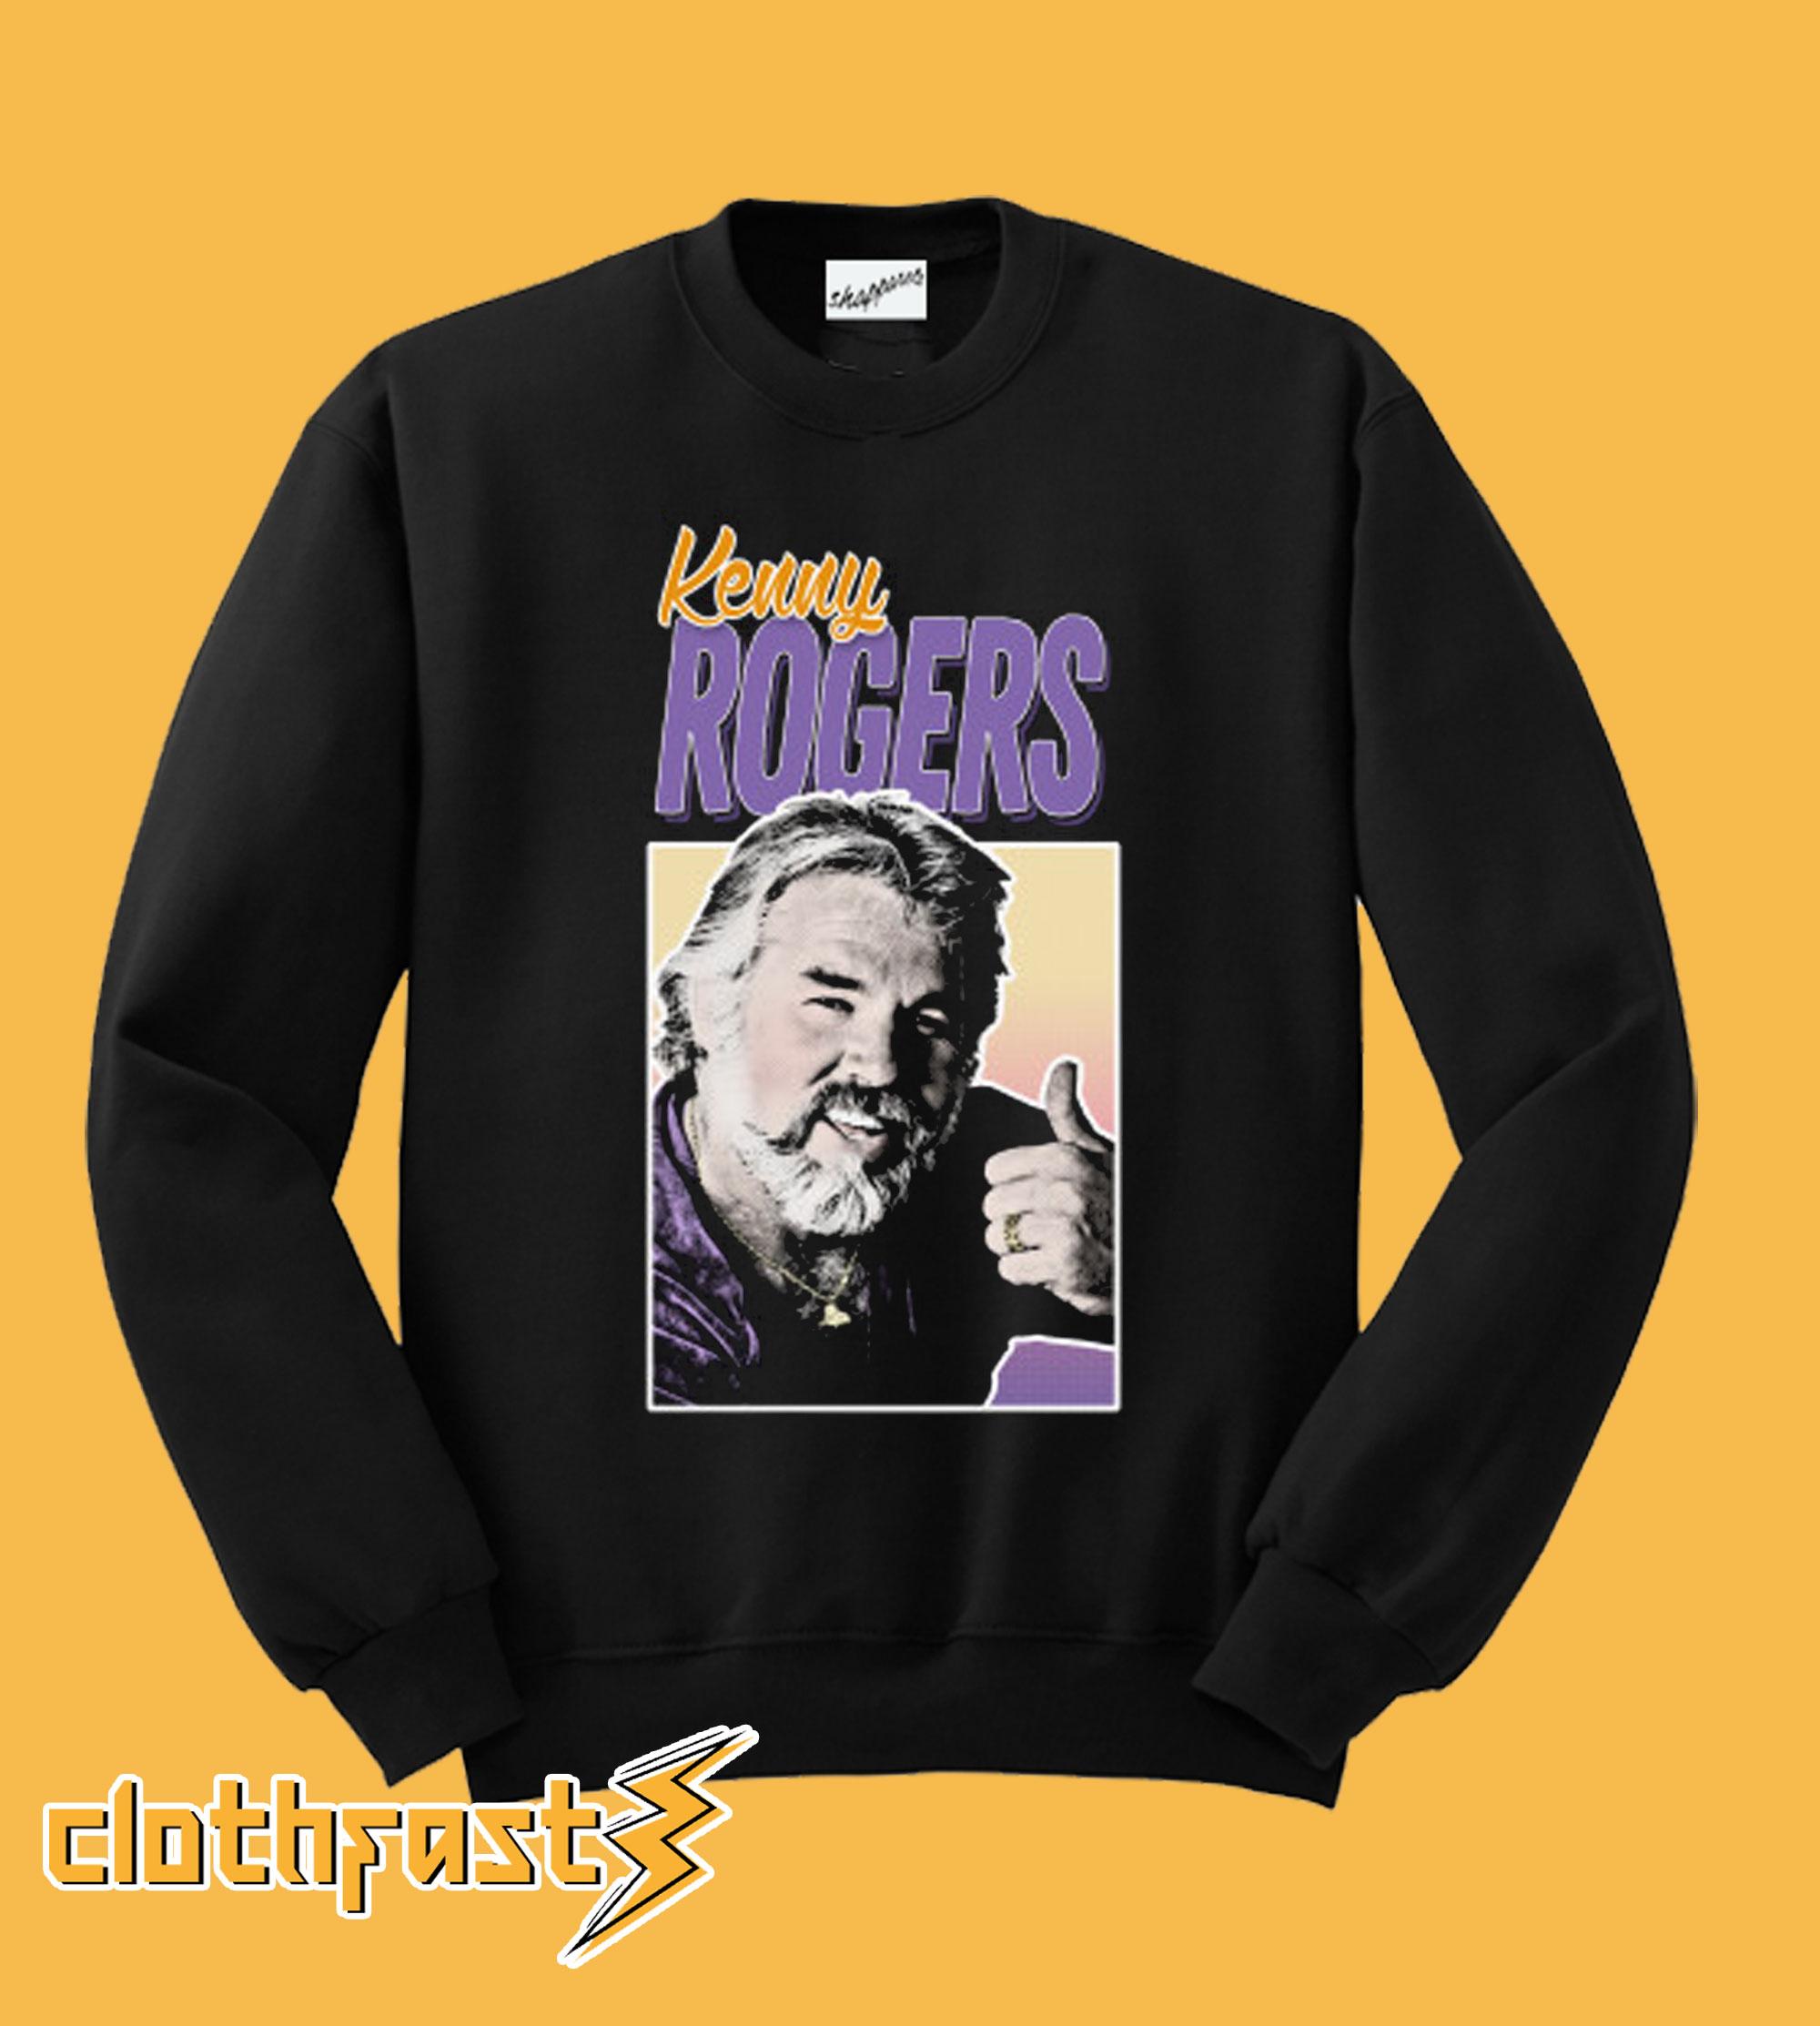 Vintage Style Kenny Rogers 80s Sweatshirt